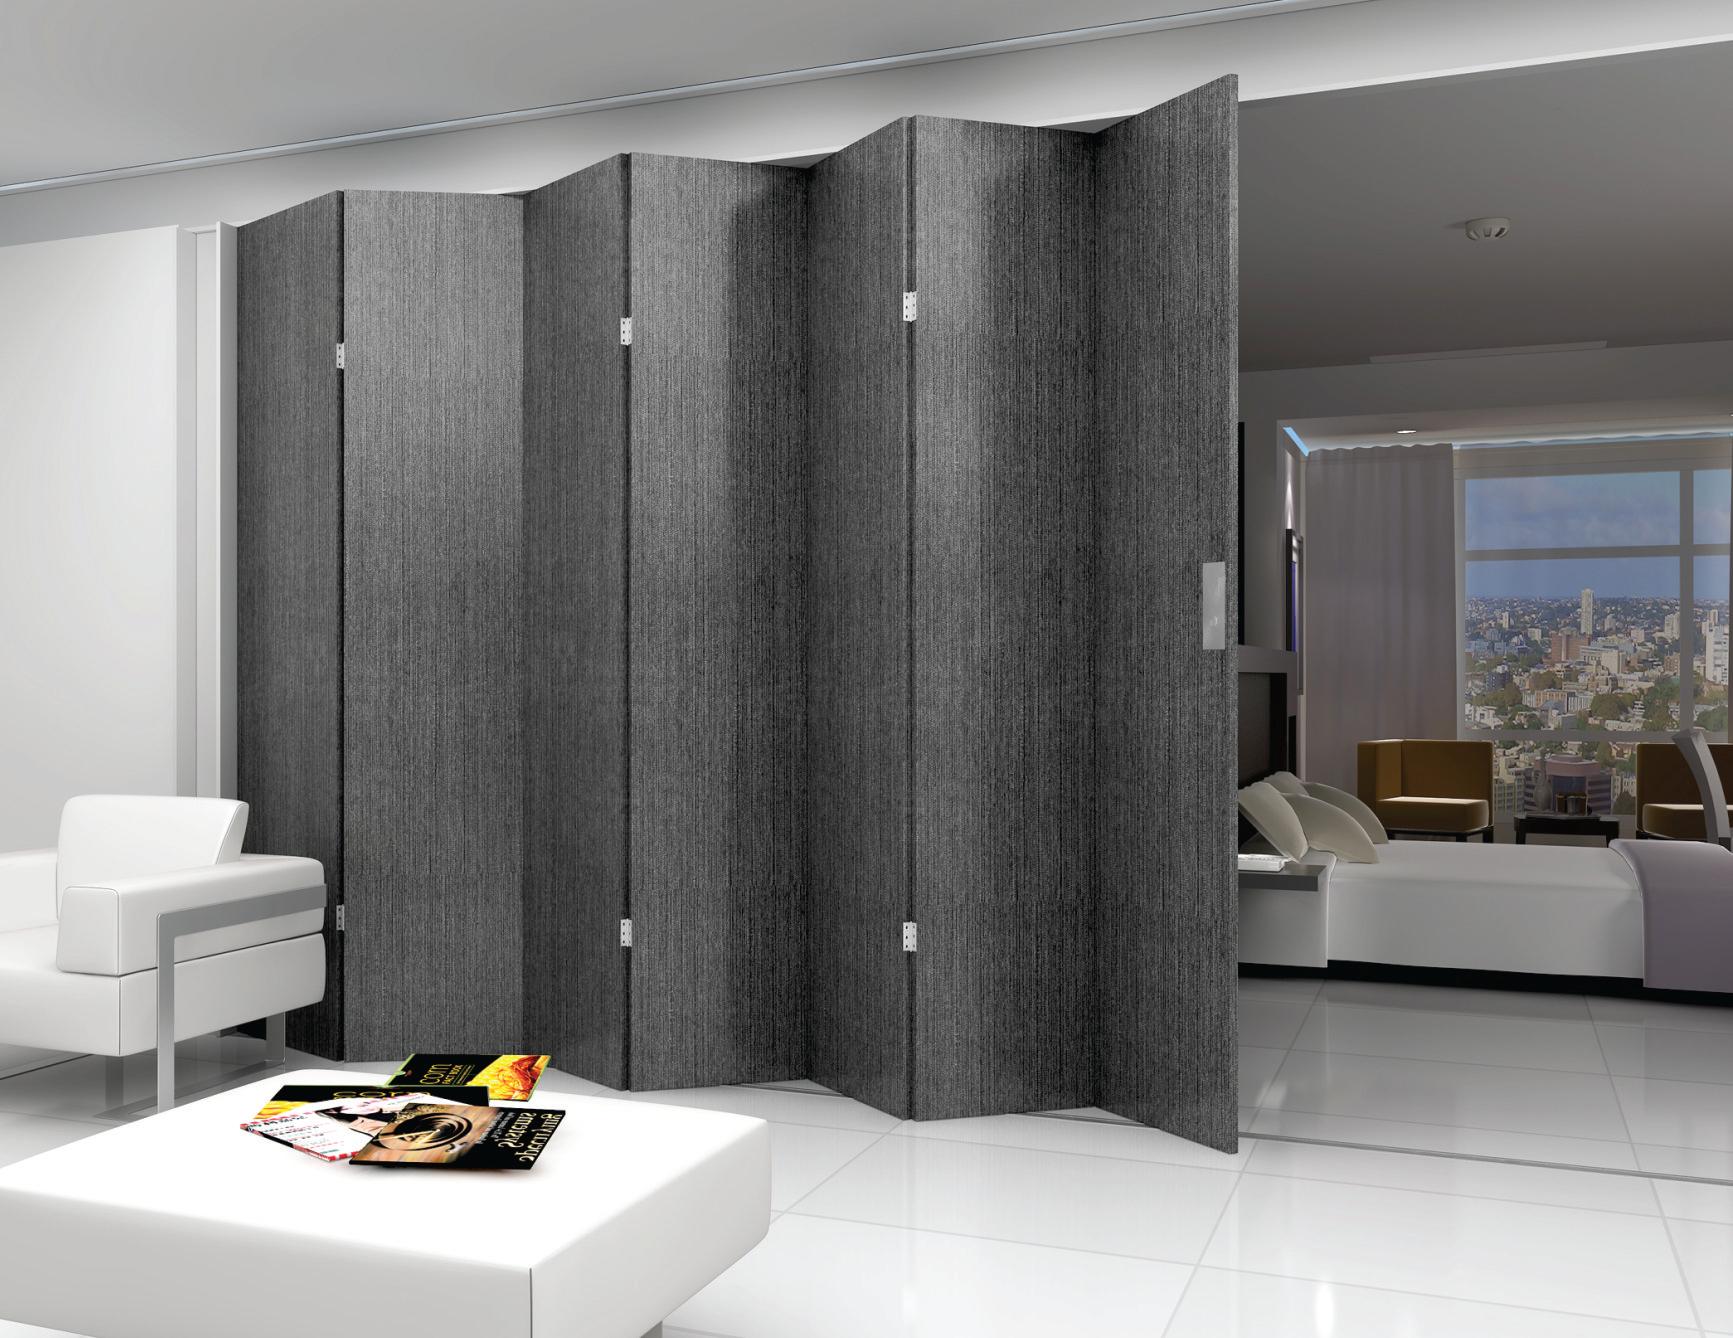 hafele doors h fele expertise in sliding and soft closing door. Black Bedroom Furniture Sets. Home Design Ideas